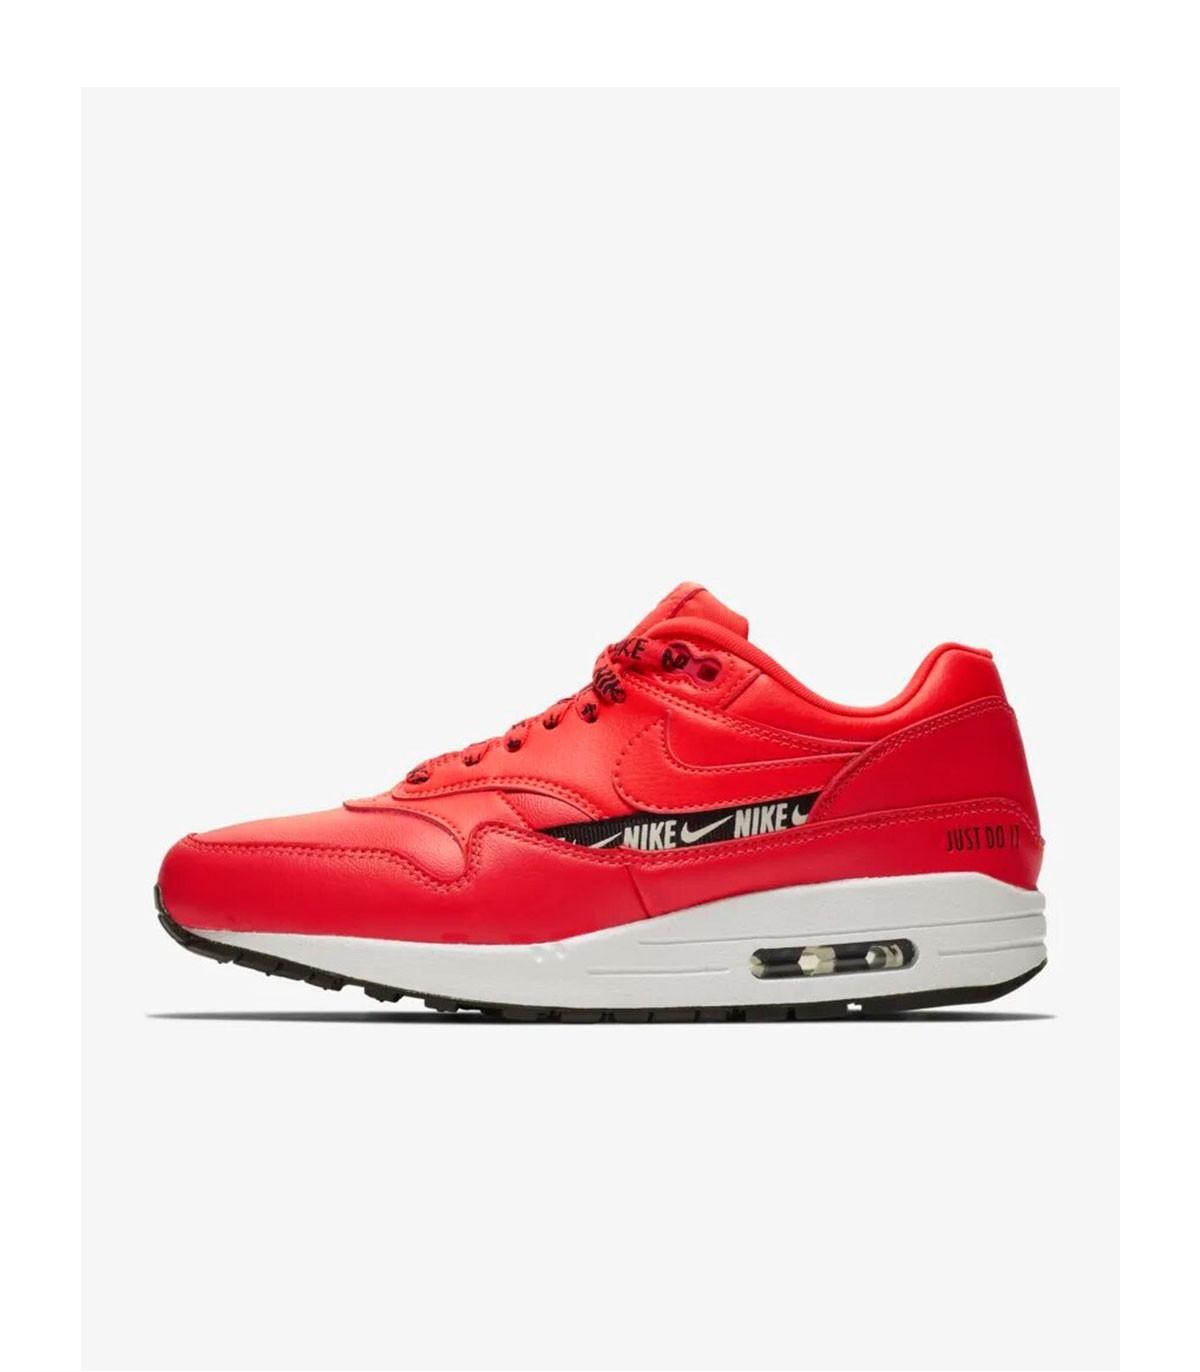 newest 3593a 761ce Zapatillas Nike Air Max 1 SE